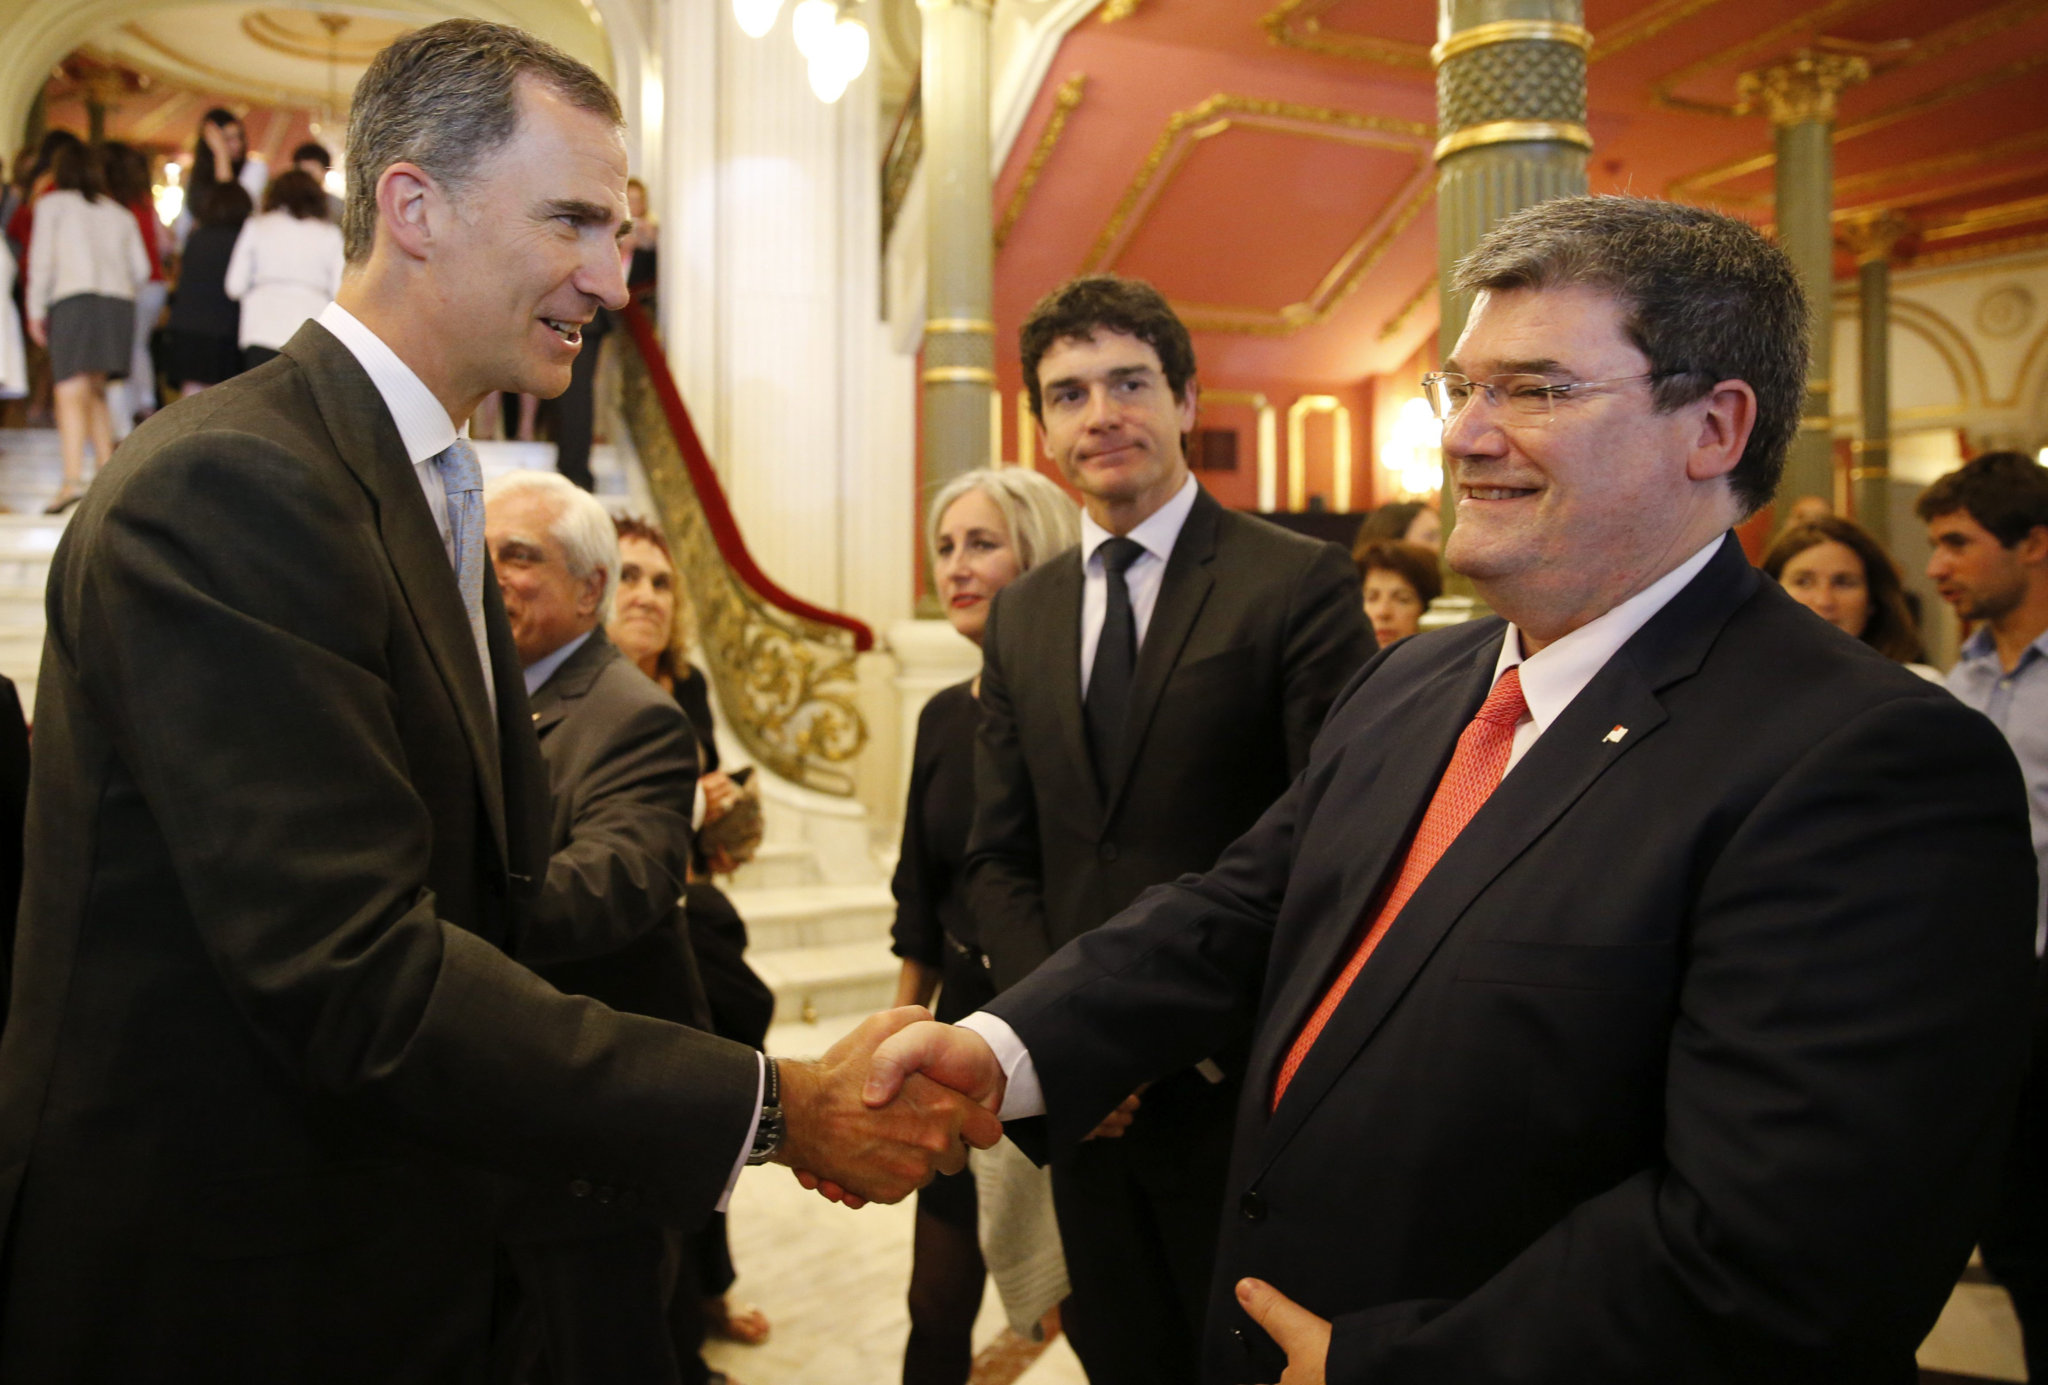 Felipe VI saluda al alcalde de Bilbao Juan Mari Aburto en presencia de Unai Rementeria.